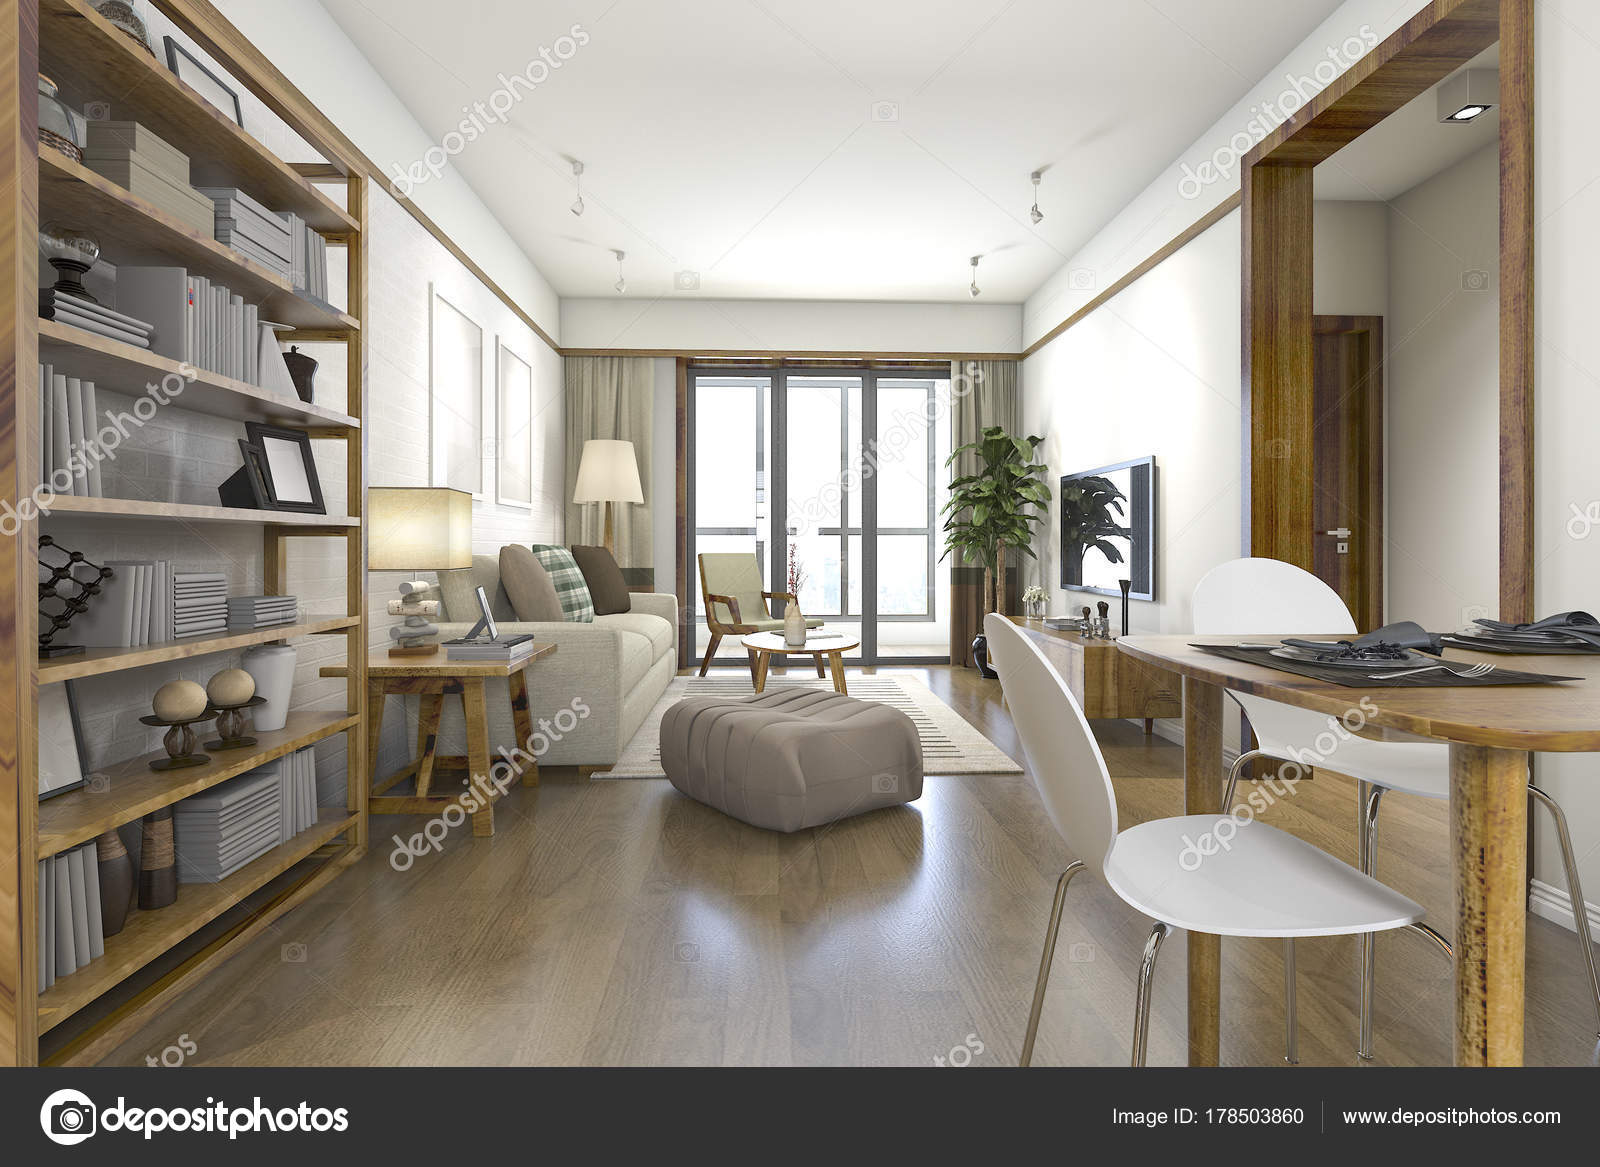 https://st3.depositphotos.com/11352286/17850/i/1600/depositphotos_178503860-stock-photo-rendering-wood-scandinavian-living-dining.jpg